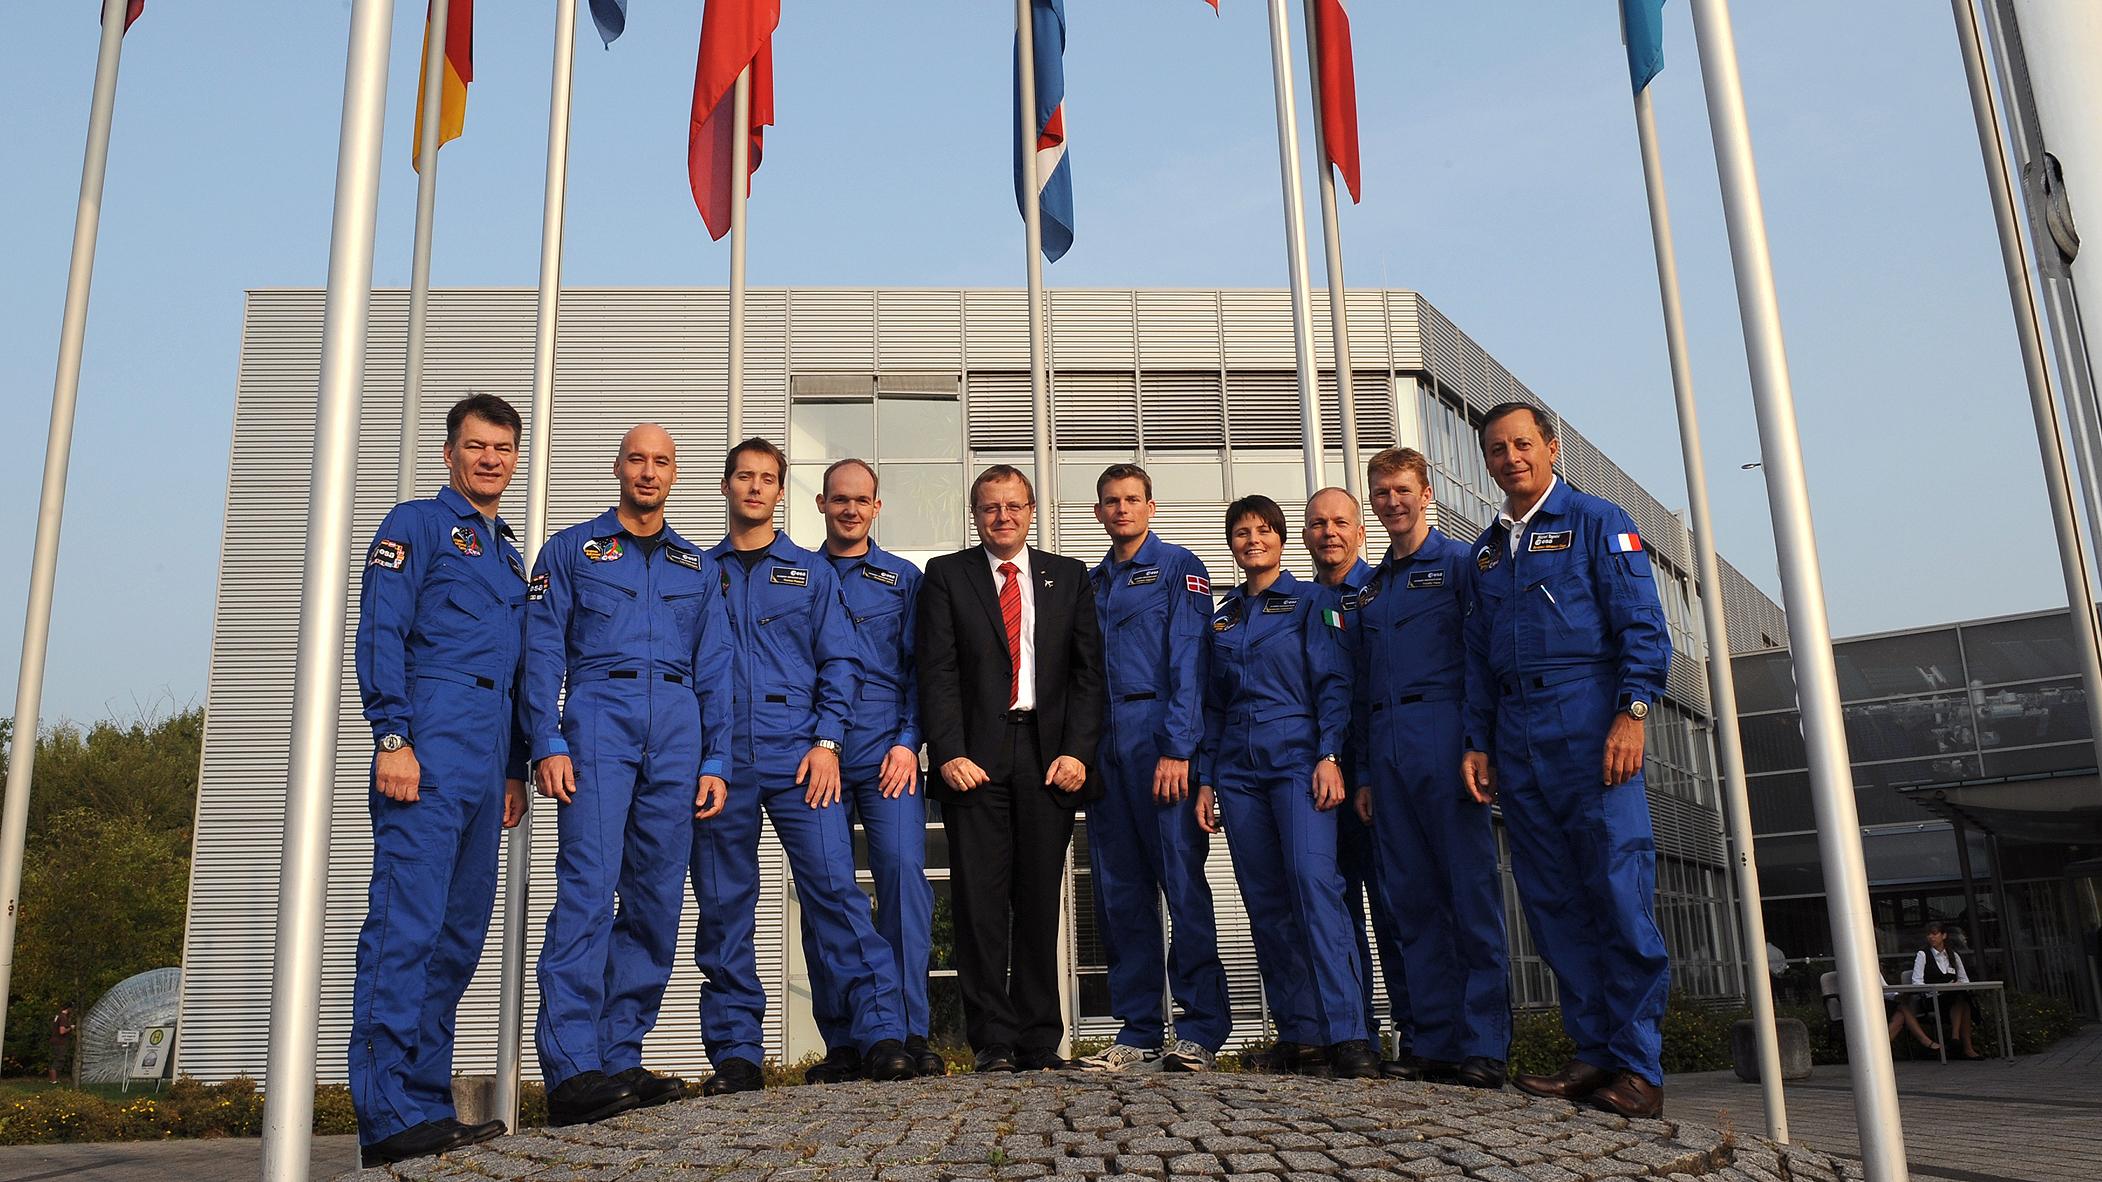 astronaut corps - photo #5